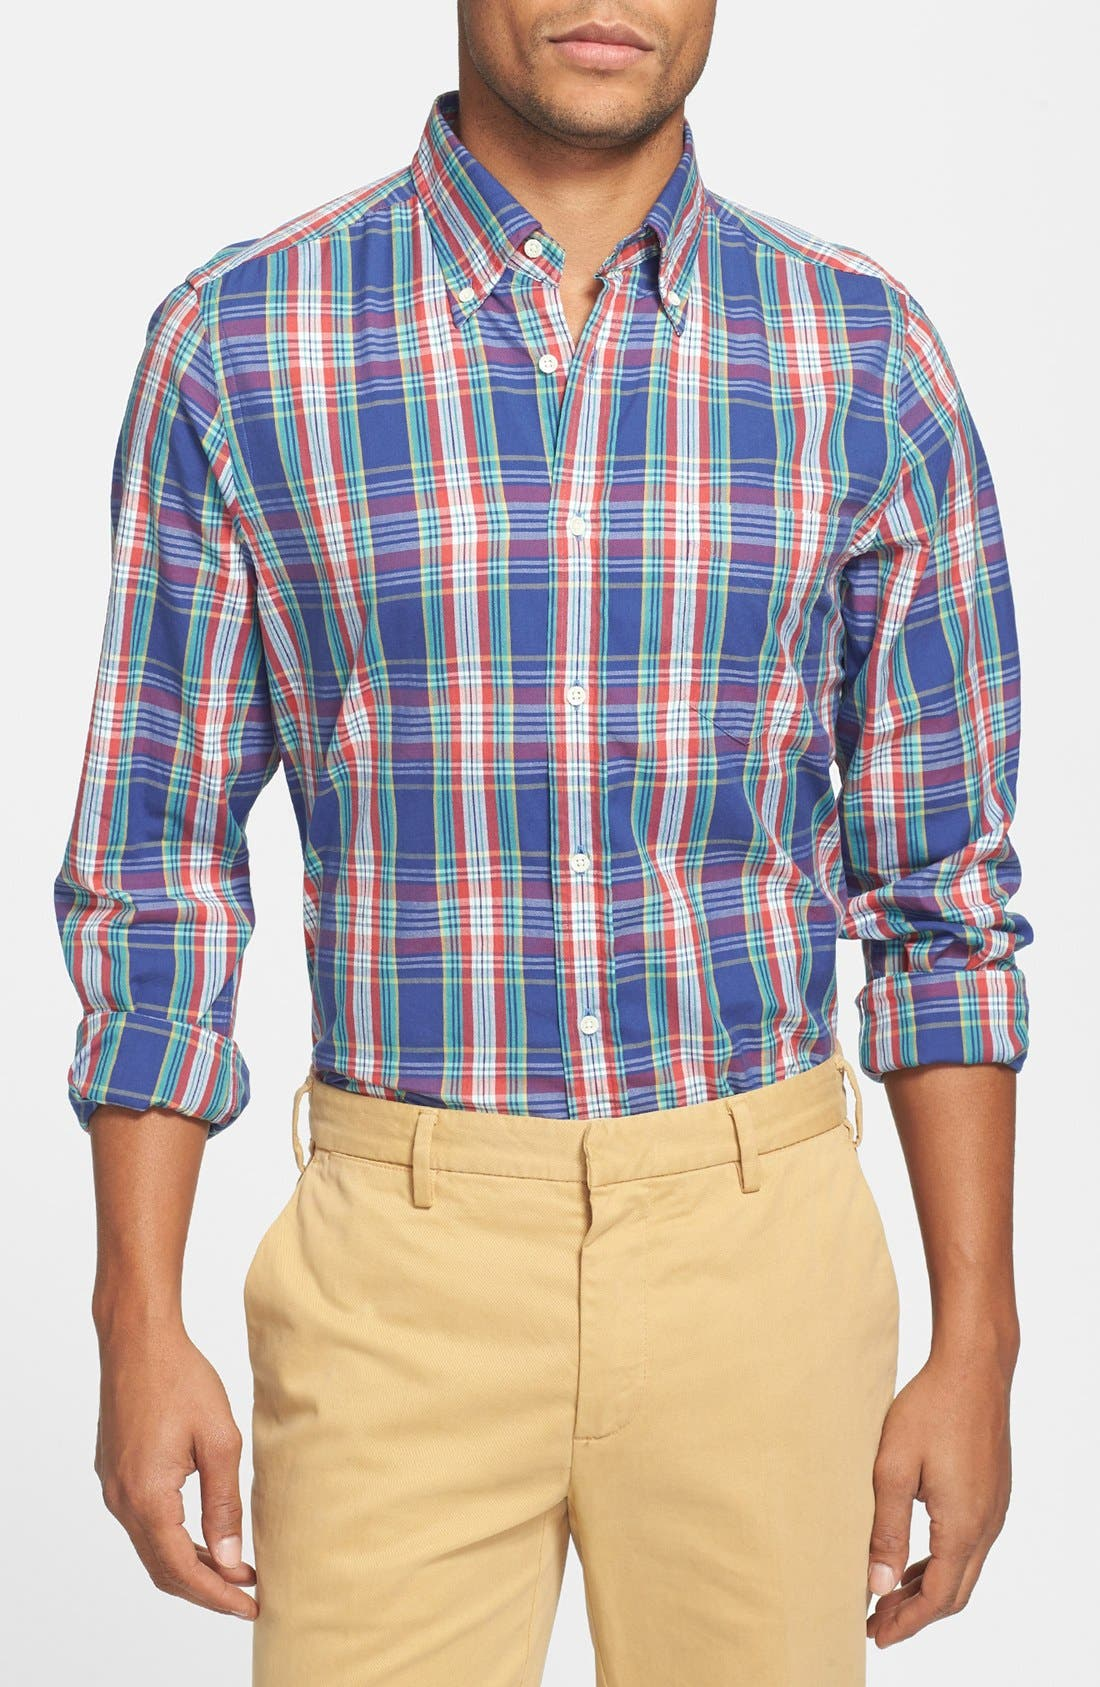 Alternate Image 1 Selected - Gant Rugger 'Dreamy' Plaid Oxford Shirt